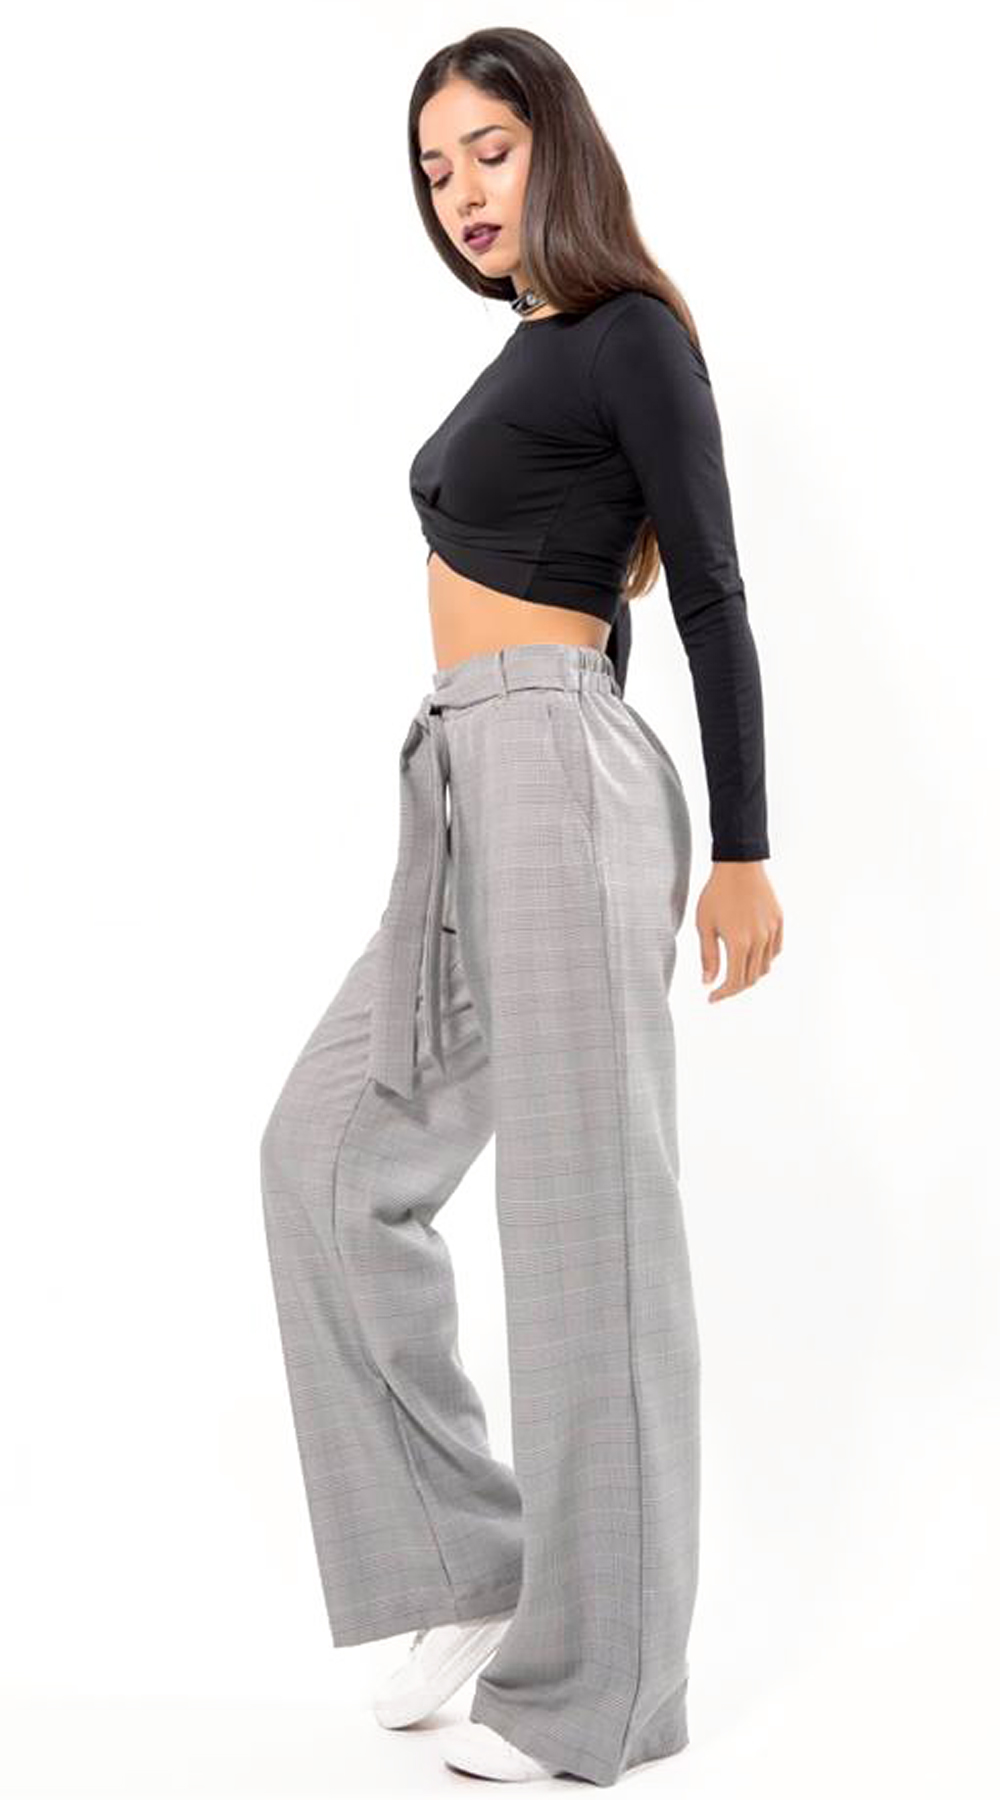 080fc384e55 Γυναικείο φαρδύ παντελόνι καρό | ΚΟΛΑΝ - ΠΑΝΤΕΛΟΝΙΑ | missreina.com